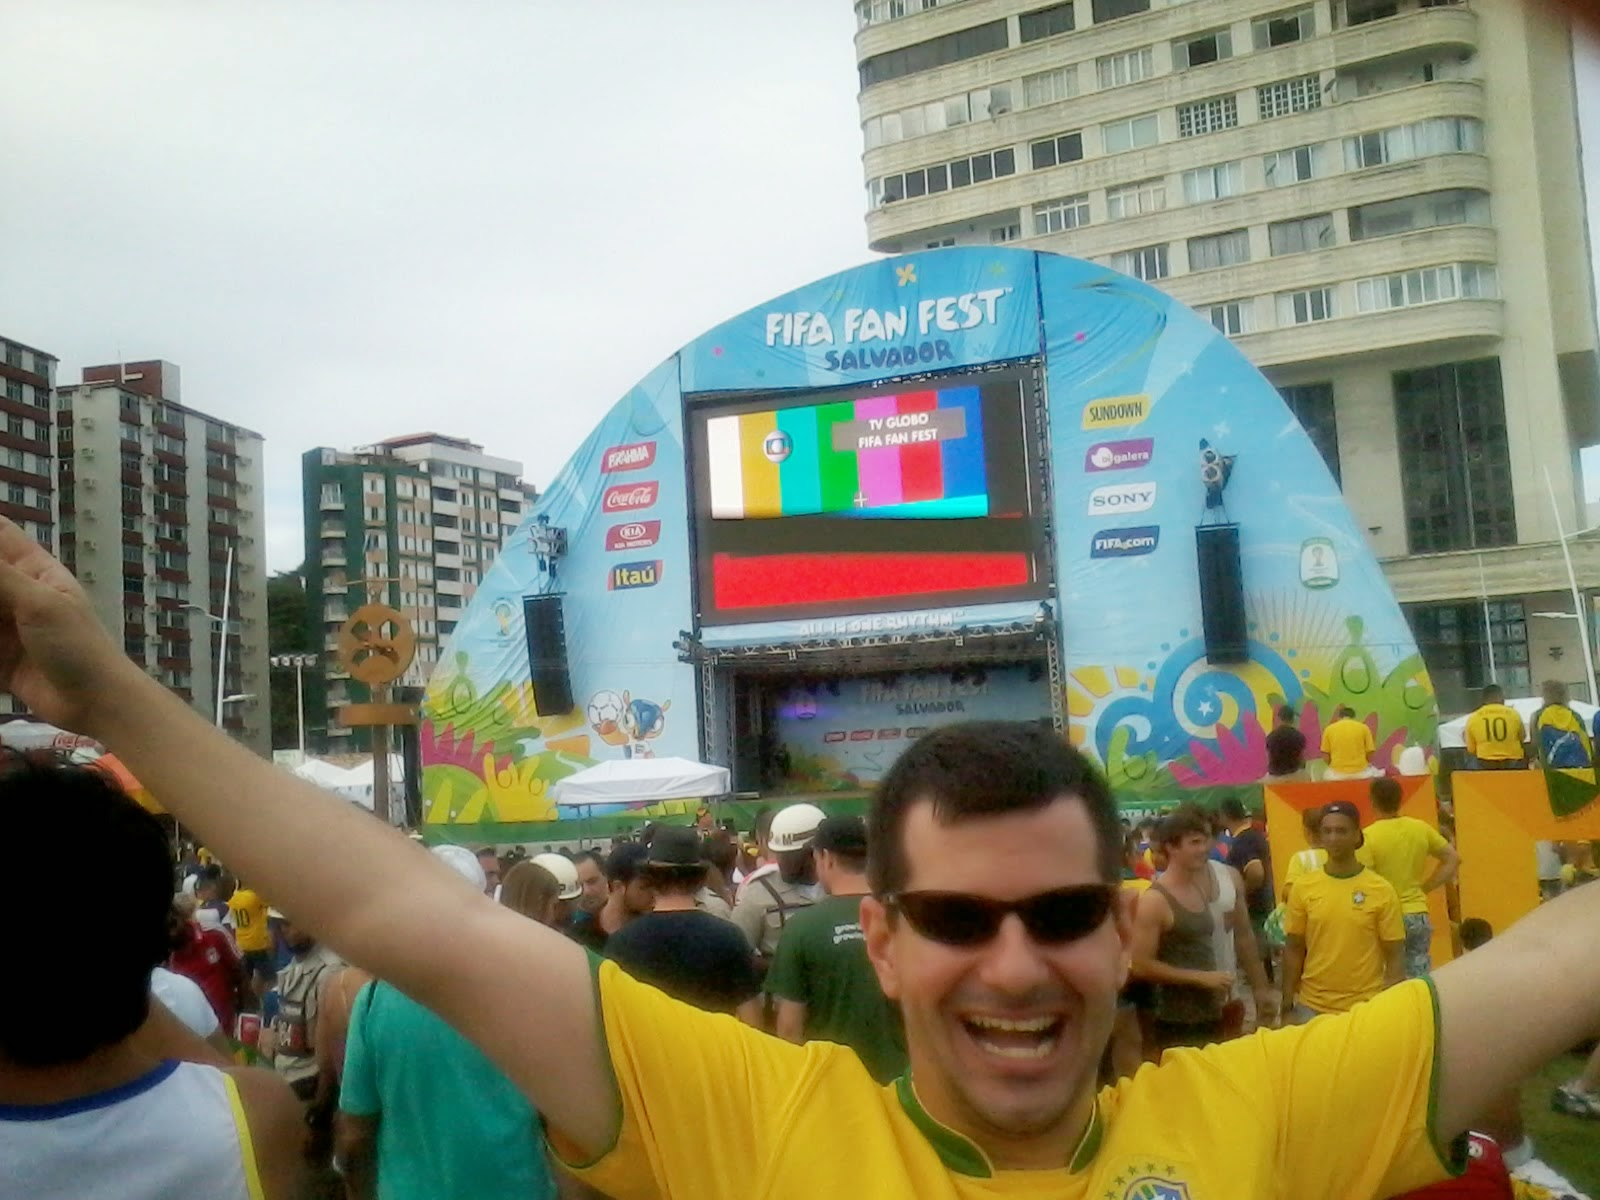 Fifa Fan Fest Salvador - Bahia - Copa do Mundo Brasil 2014 - Farol da Barra